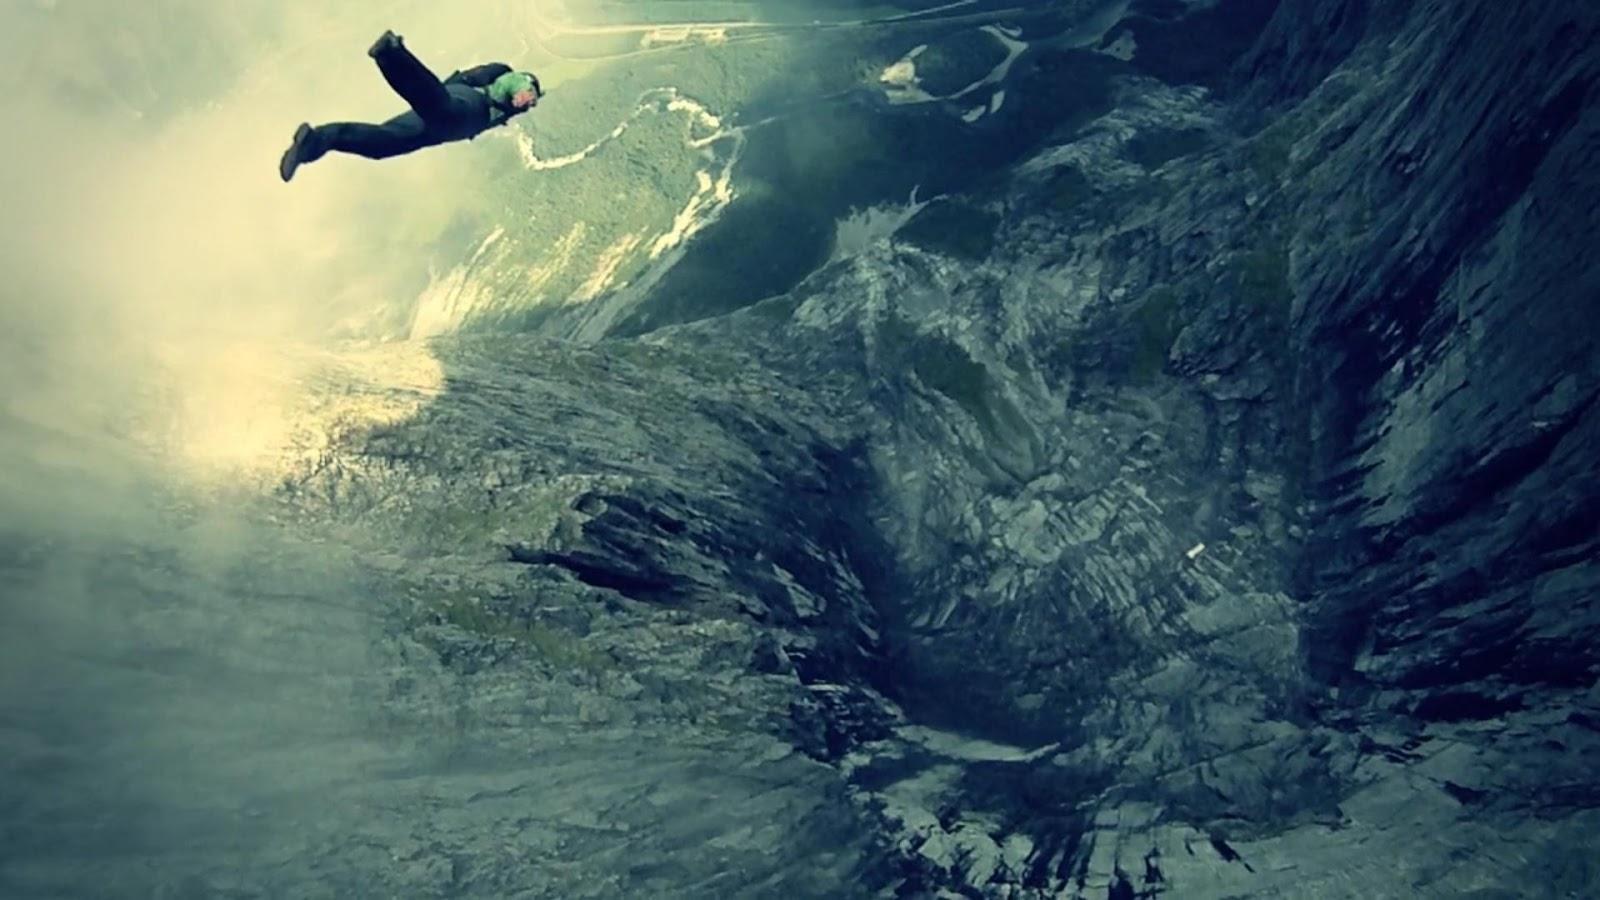 http://2.bp.blogspot.com/-RzwiCnor3fs/UIBcPsJE-HI/AAAAAAAAFn8/zvcFCHdRfSU/s1600/sports-skydiving-extreme-sports-parachute-zero.jpg